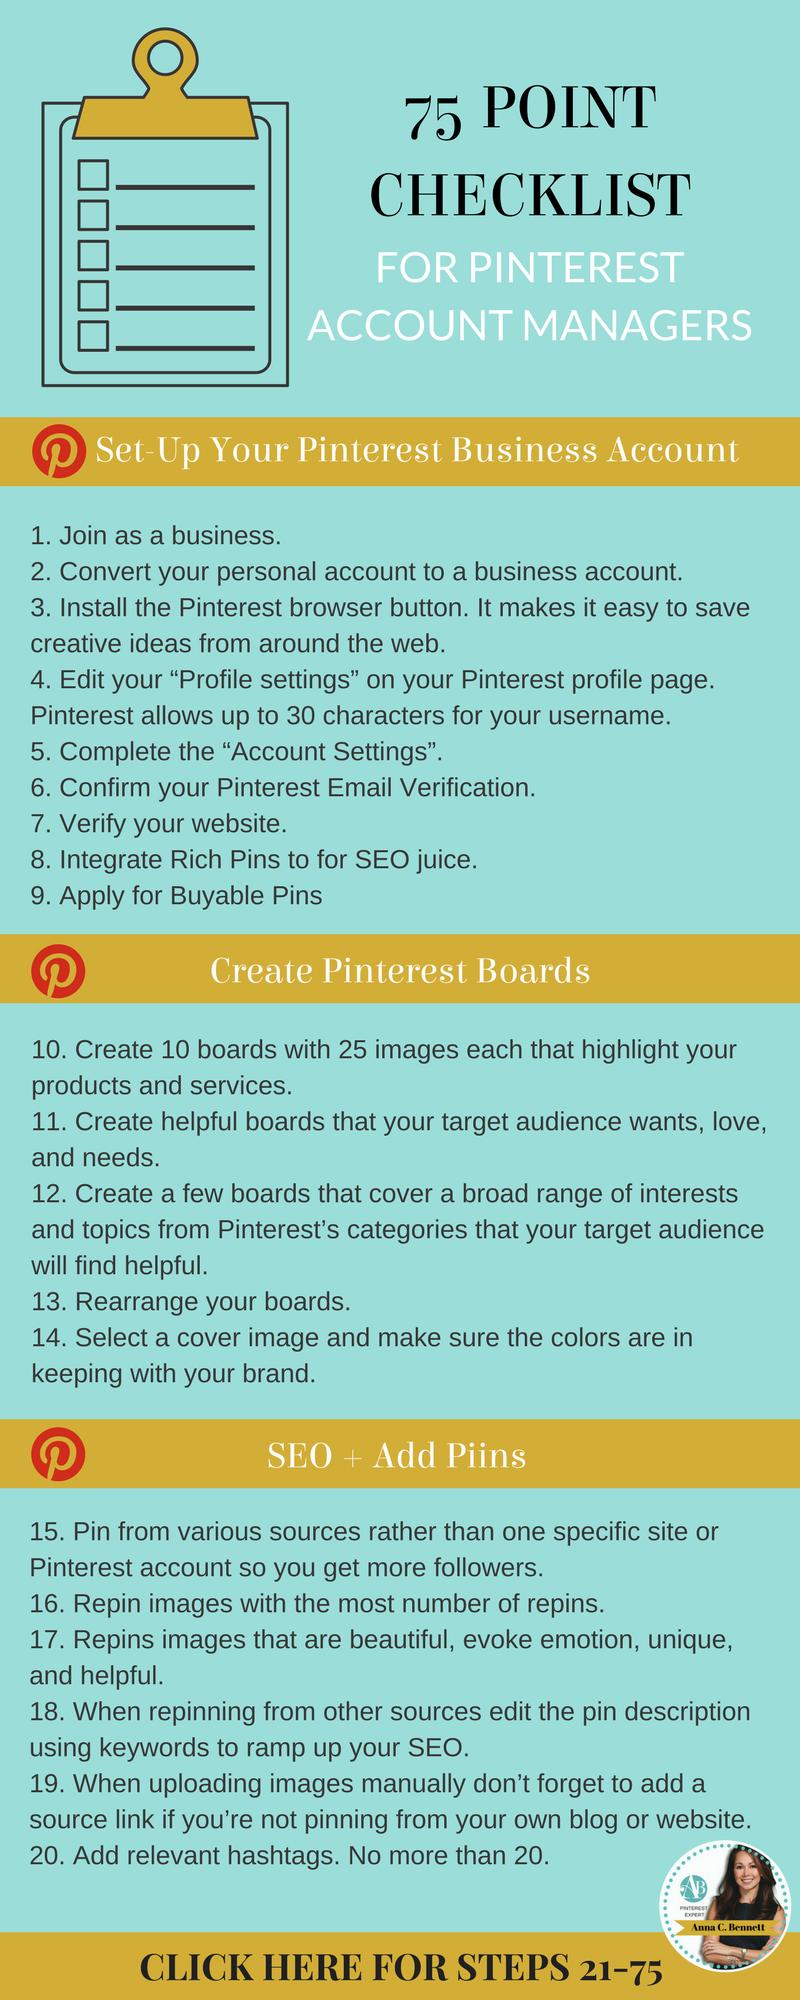 Social Media Marketing Master Pinterest For Your Business 75 Point Pinterest For Business Pinterest Marketing Business Pinterest Marketing Expert